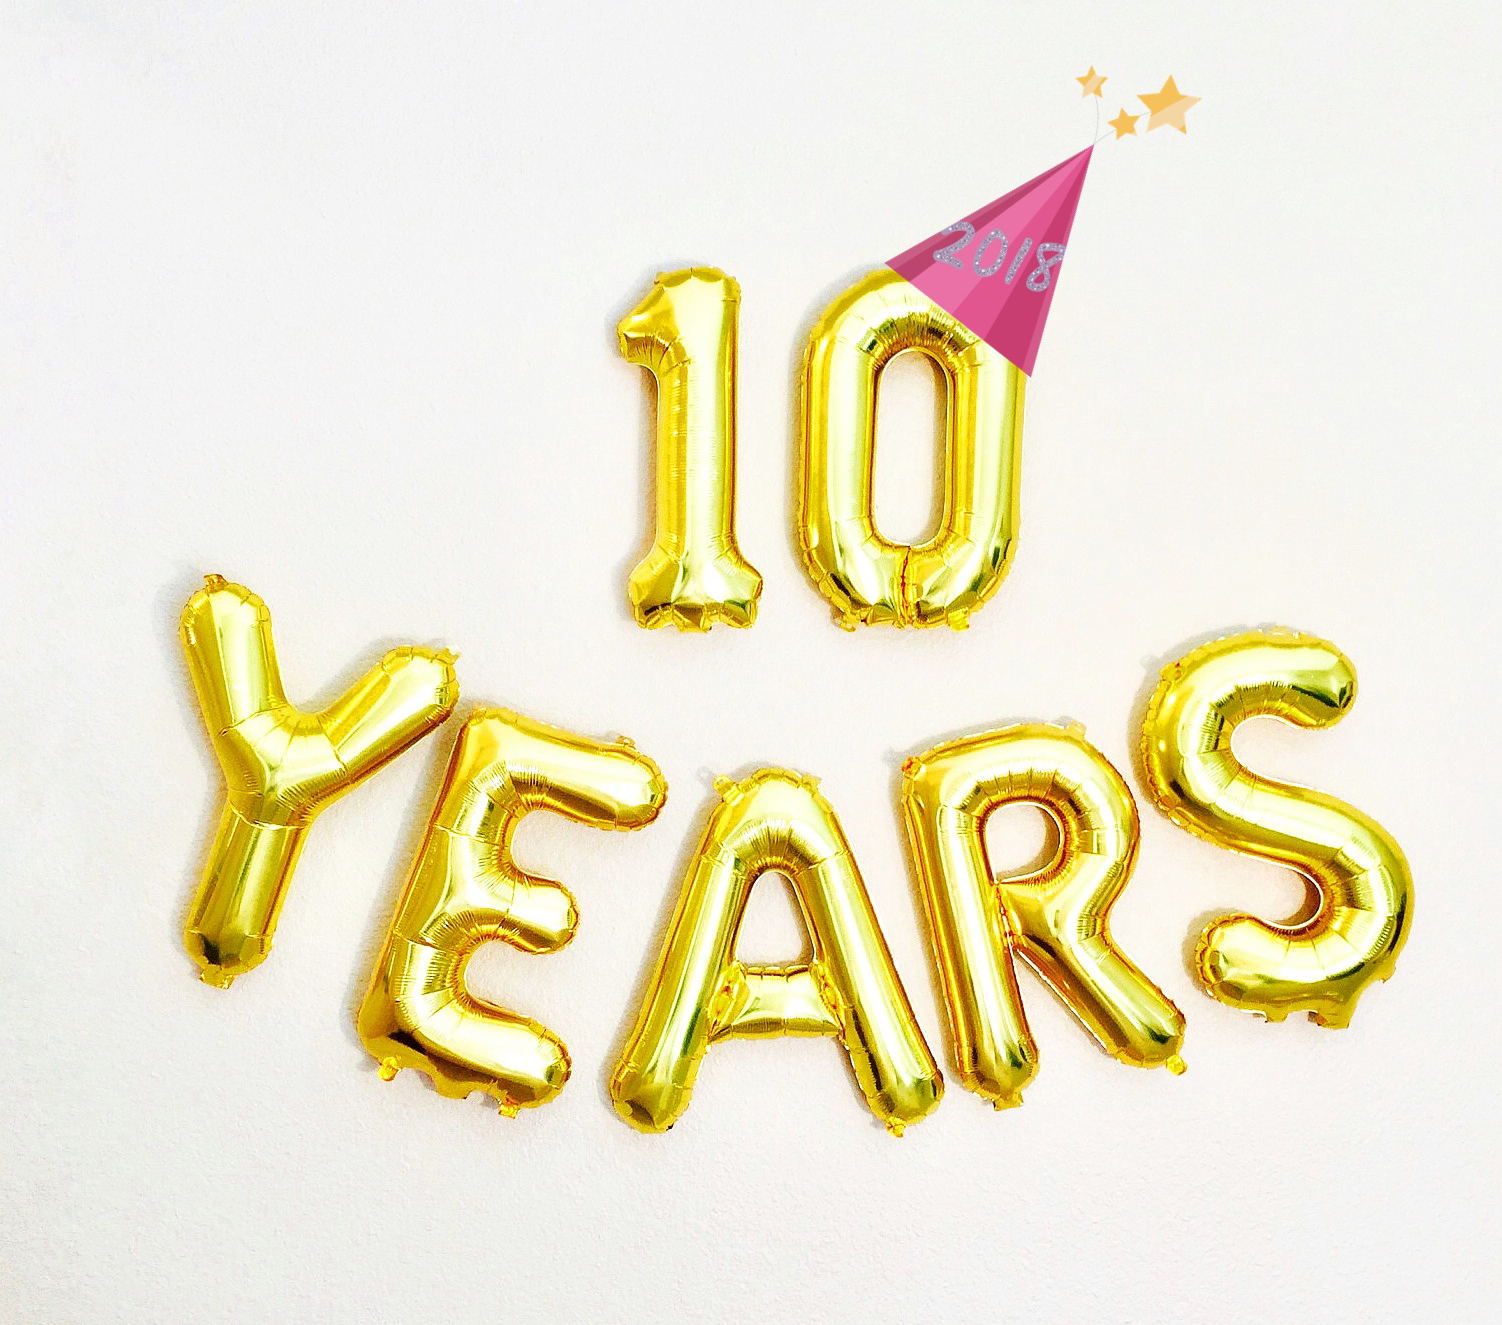 1O YEARS.jpg